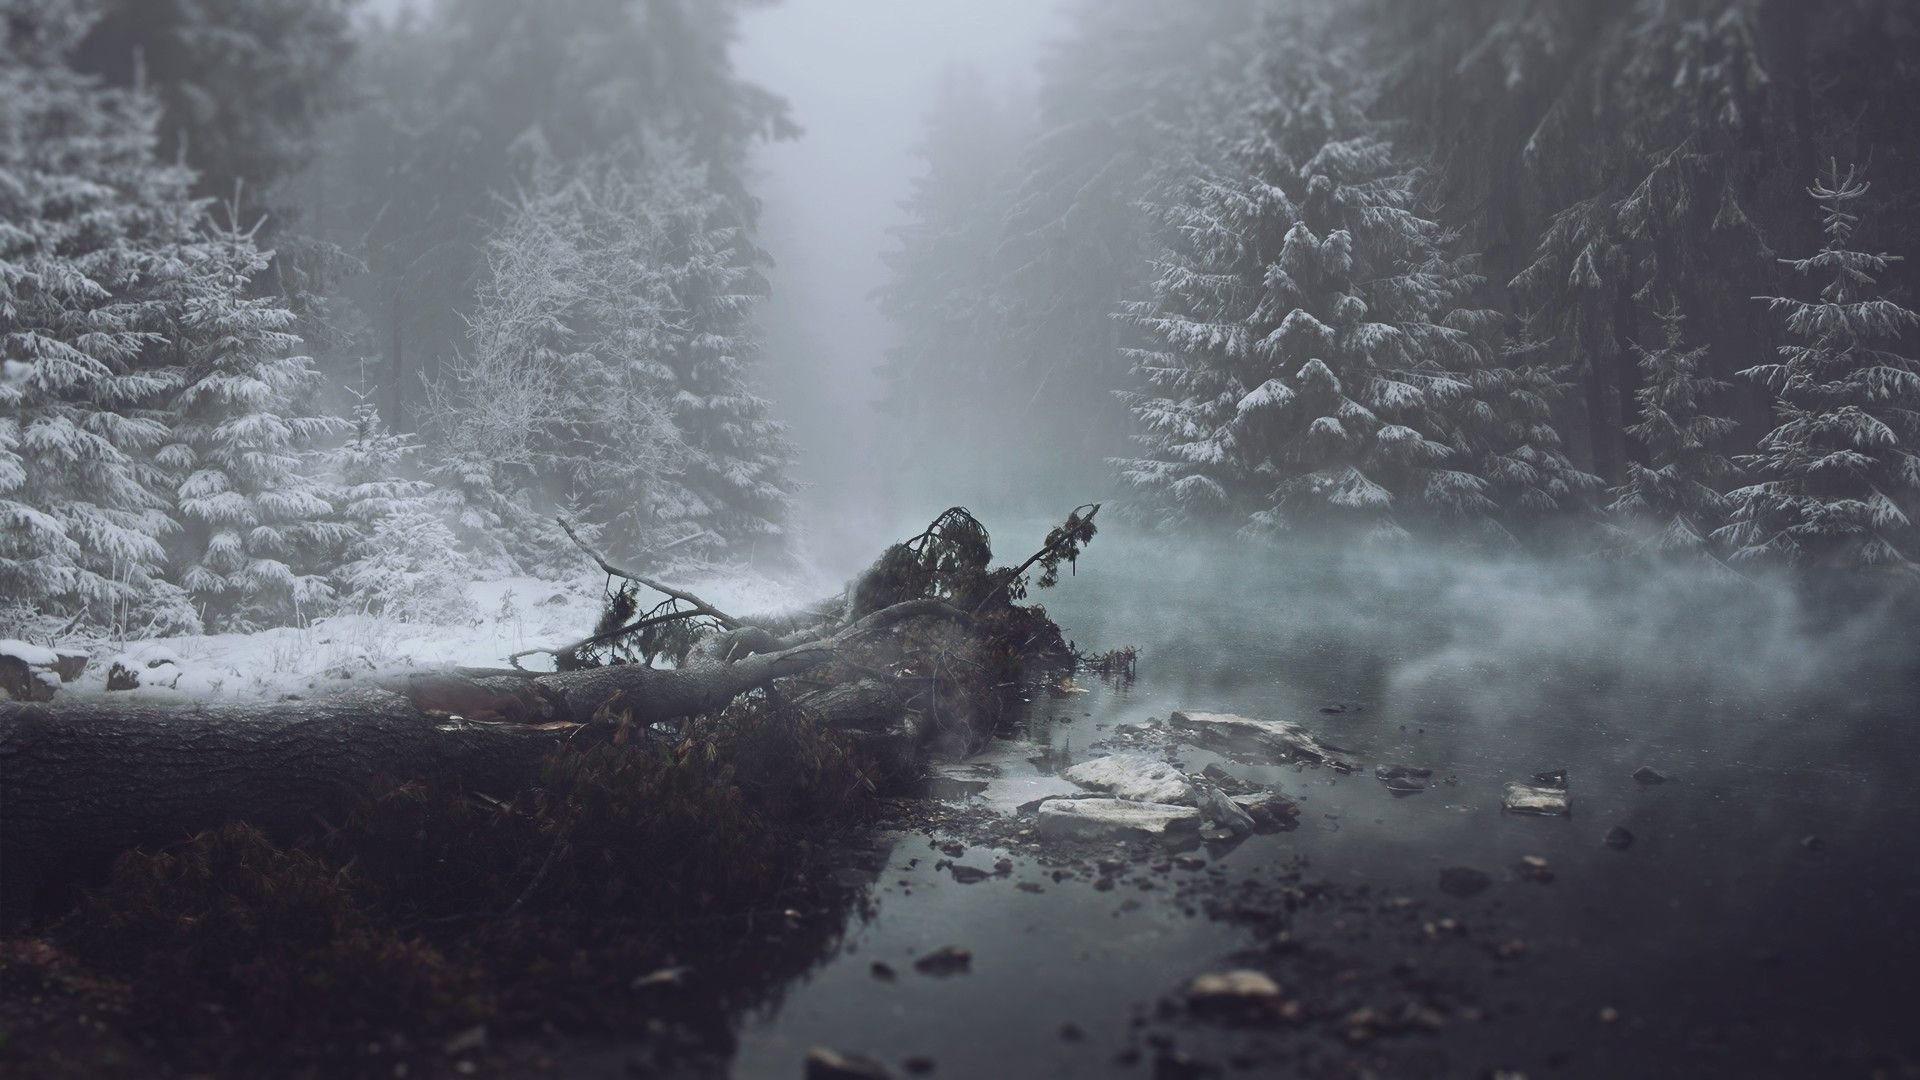 General 1920x1080 Winter Mist Trees Wallpapers Pinterest